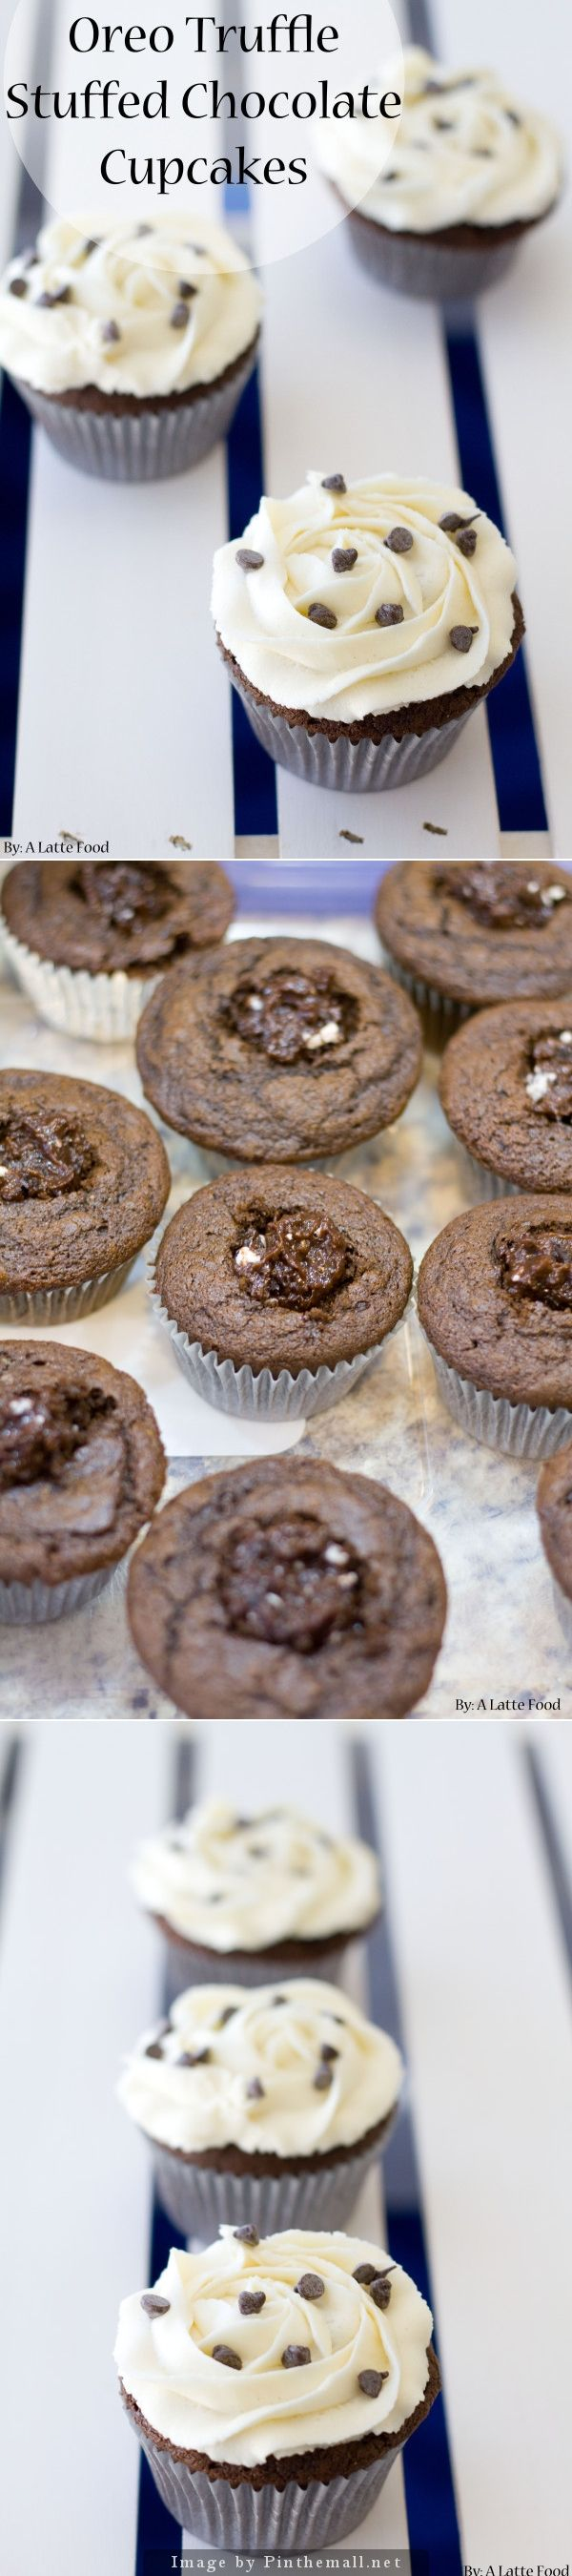 ... truffle stuffed chocolate cupcakes a latte food oreo truffle stuffed